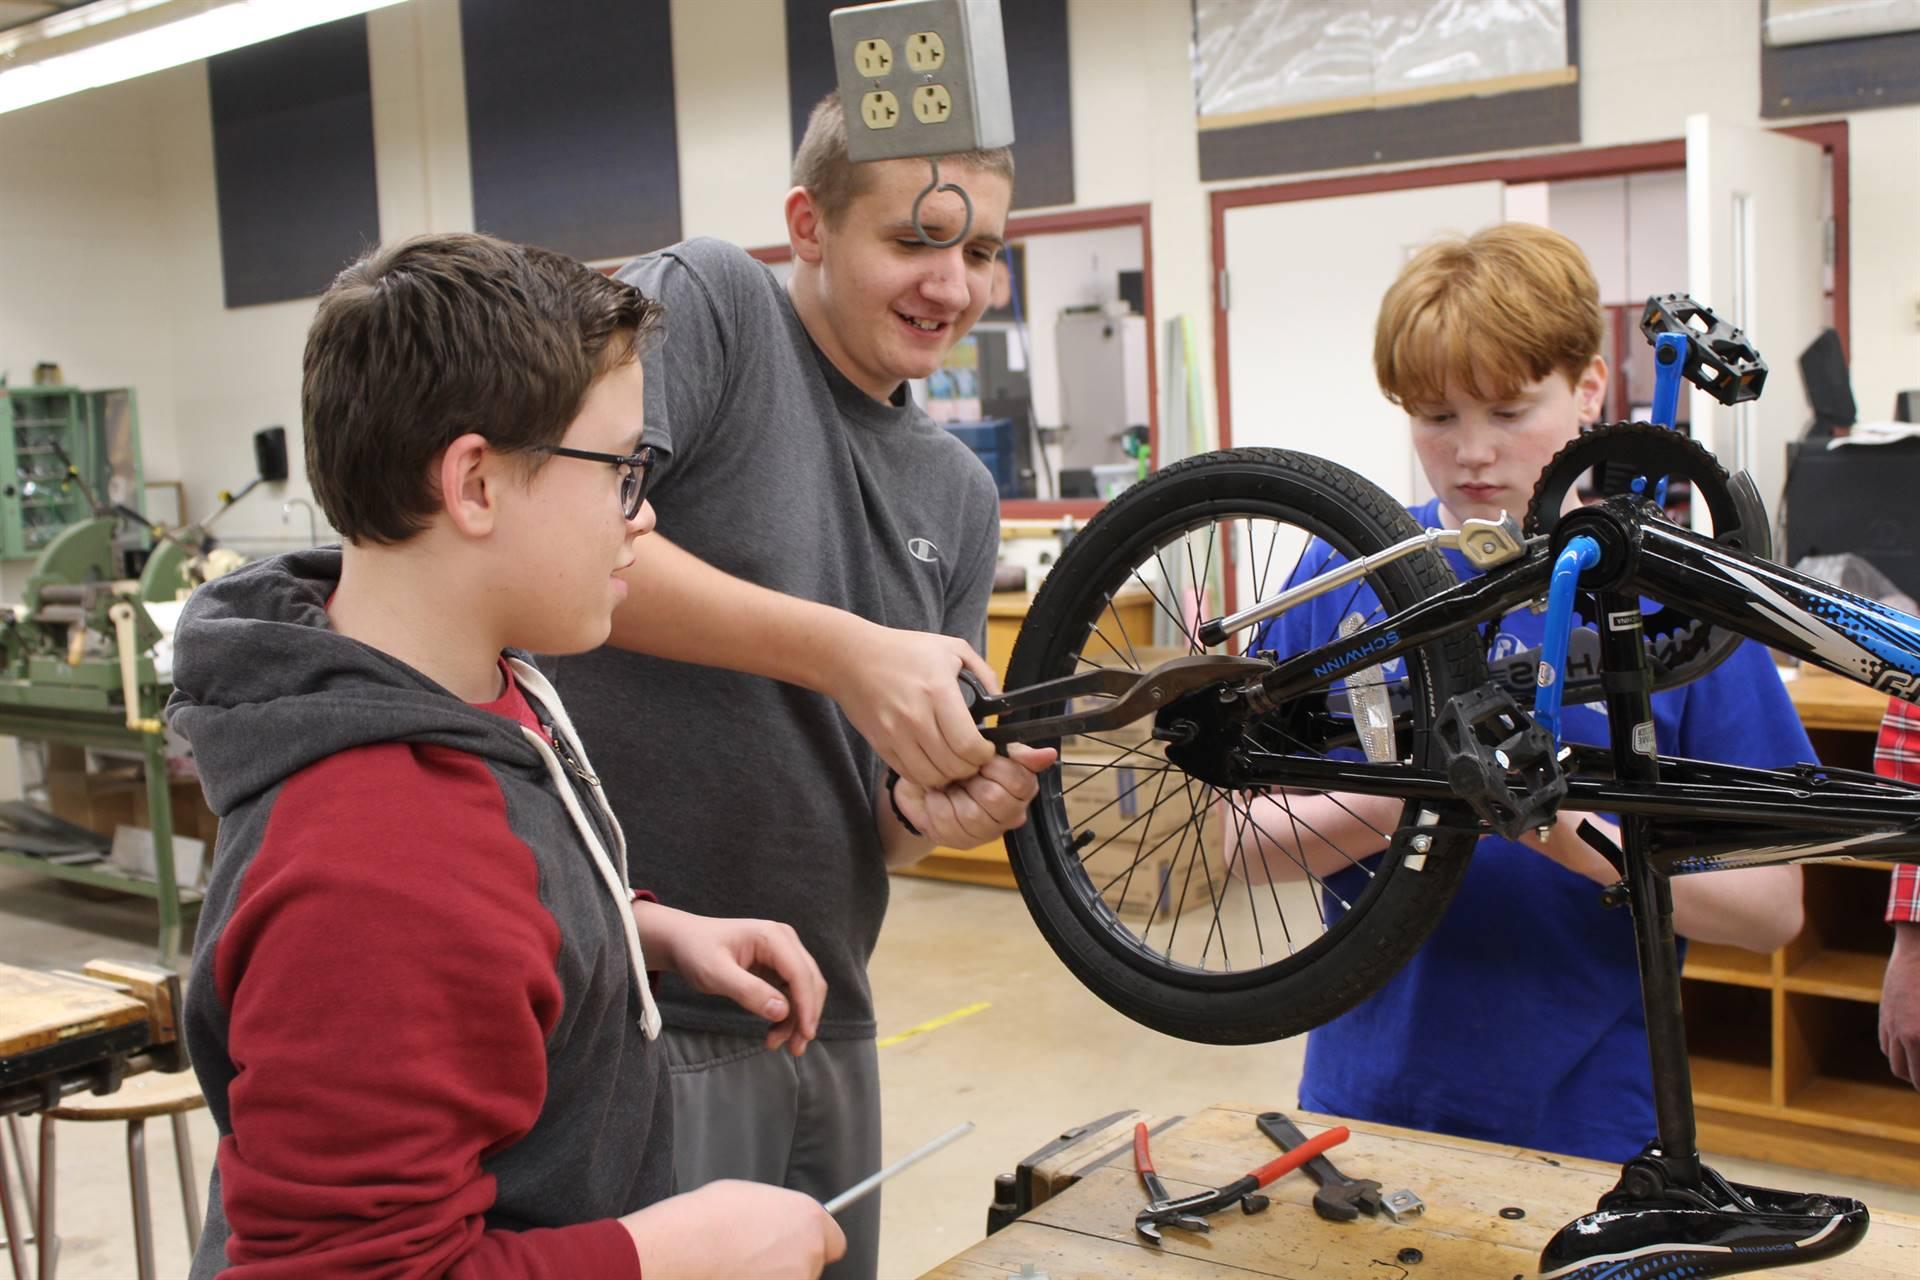 Taking the bike apart